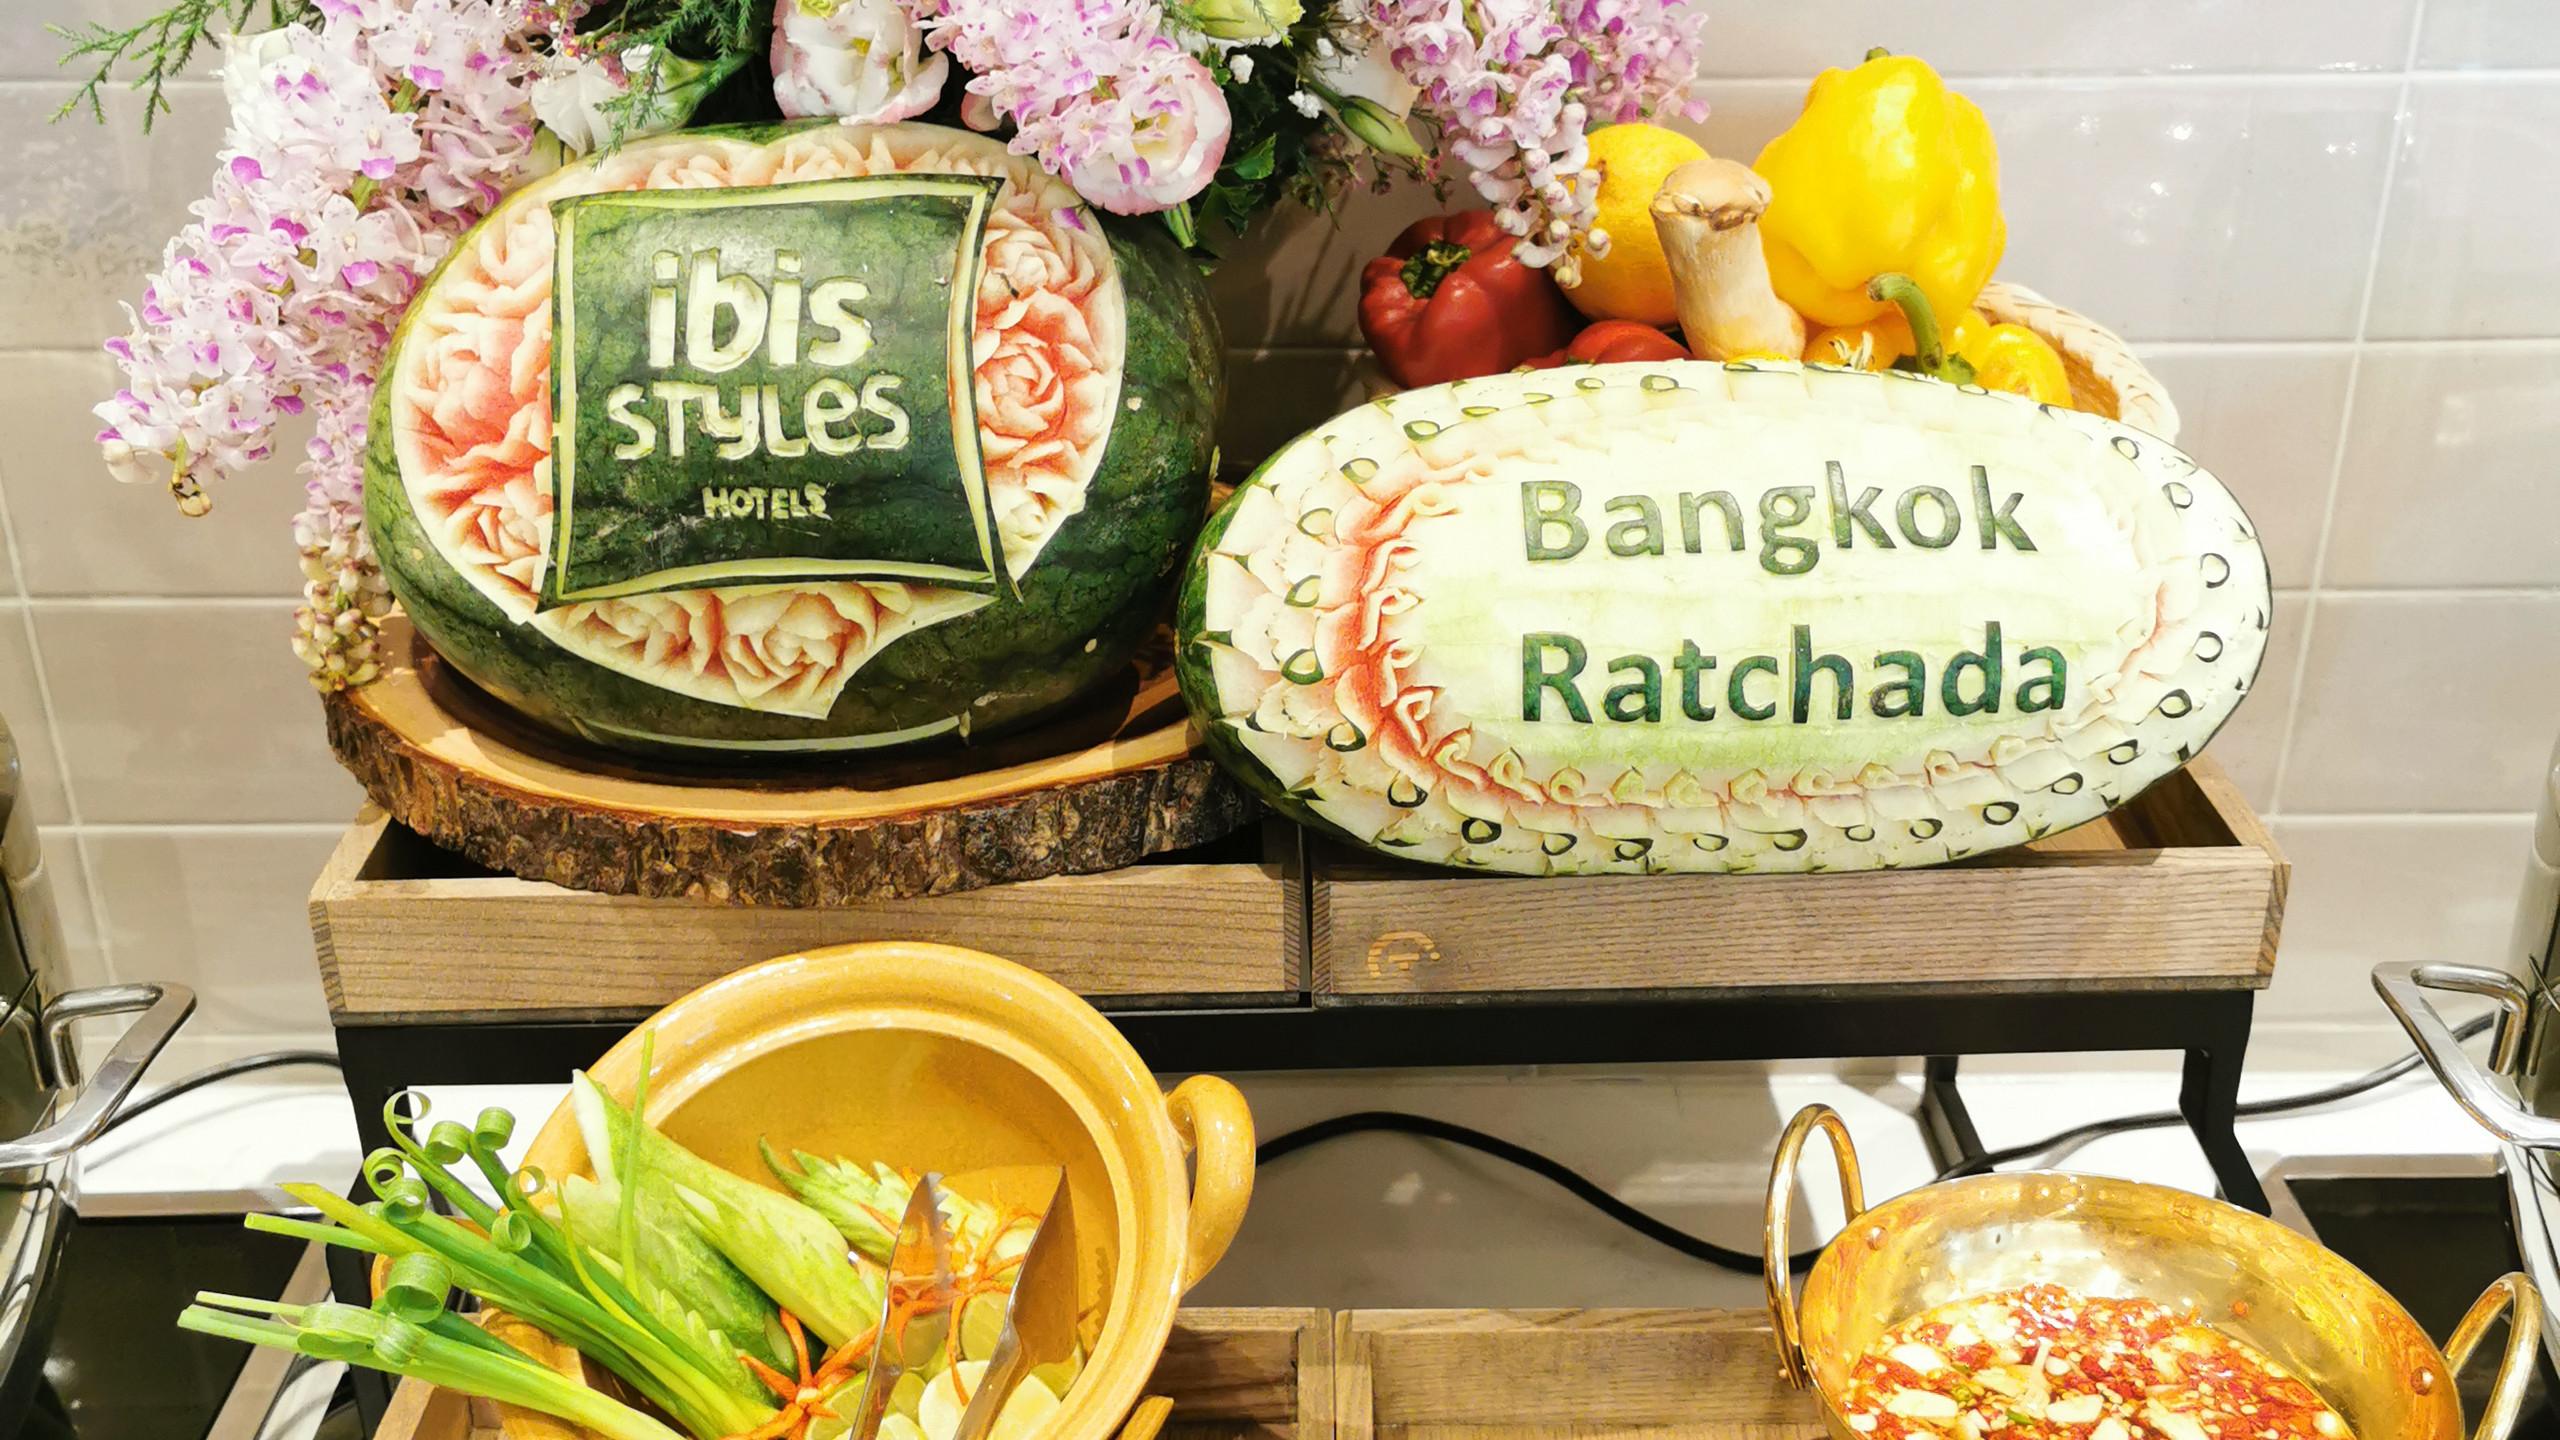 Bedroom at Ibis style Bkk Rachada